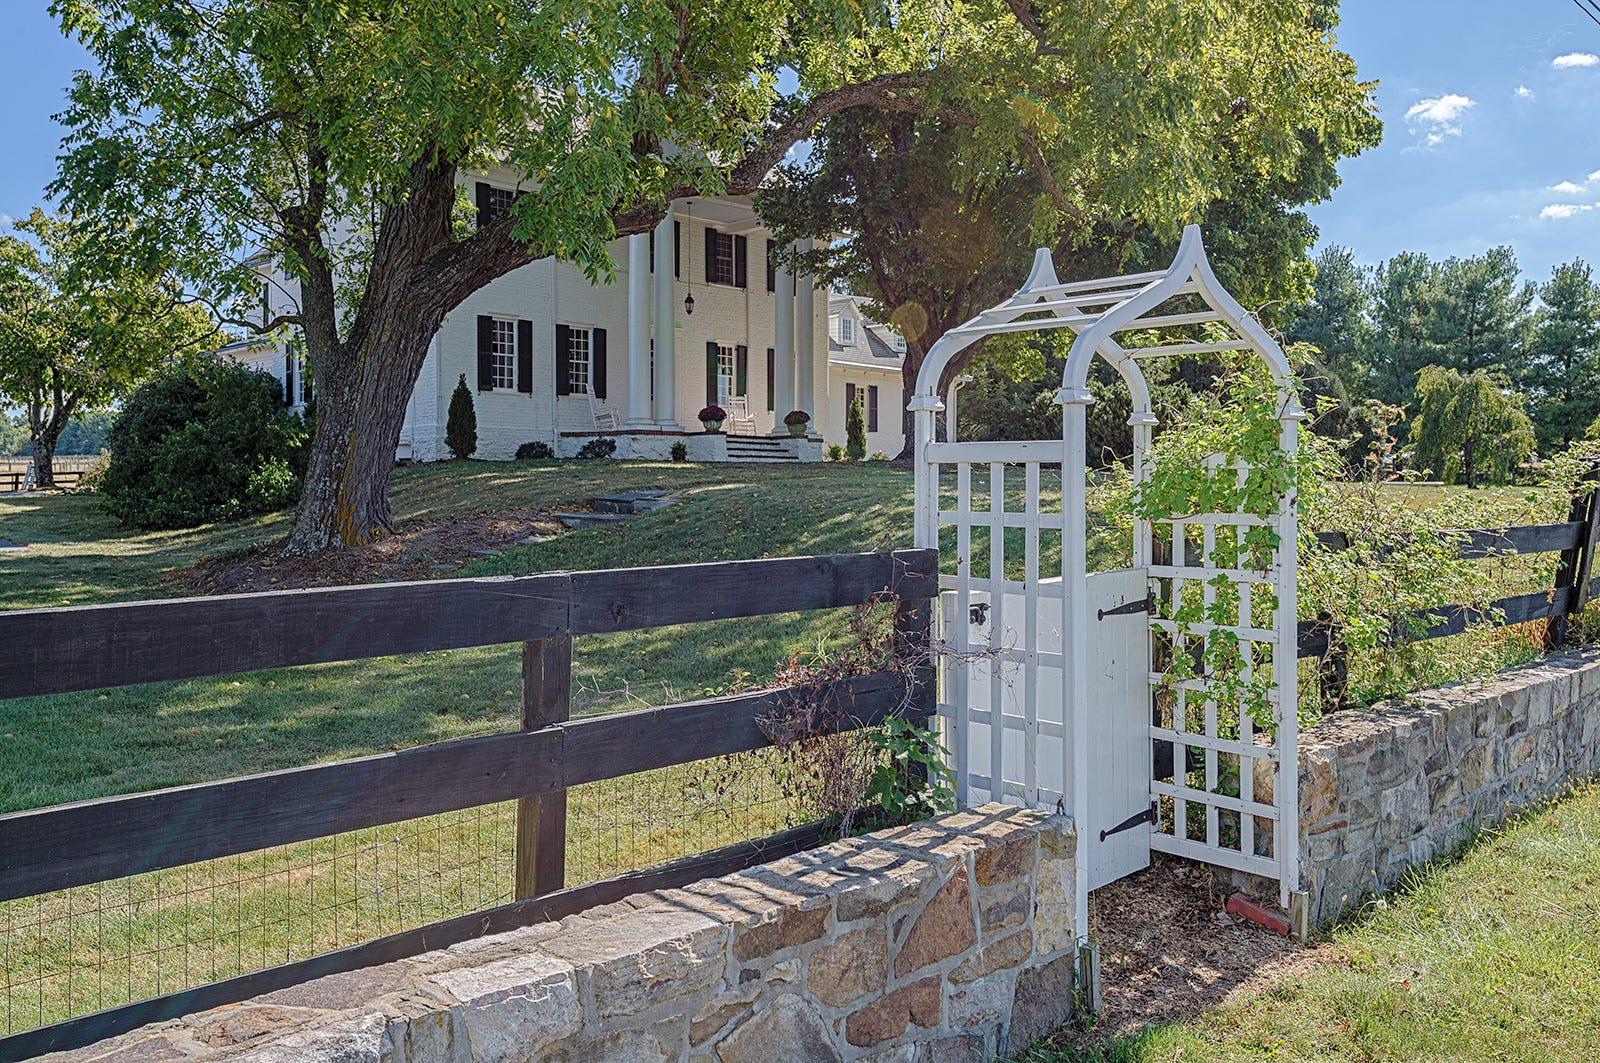 18th century Waynesboro farm up for sale — On the market